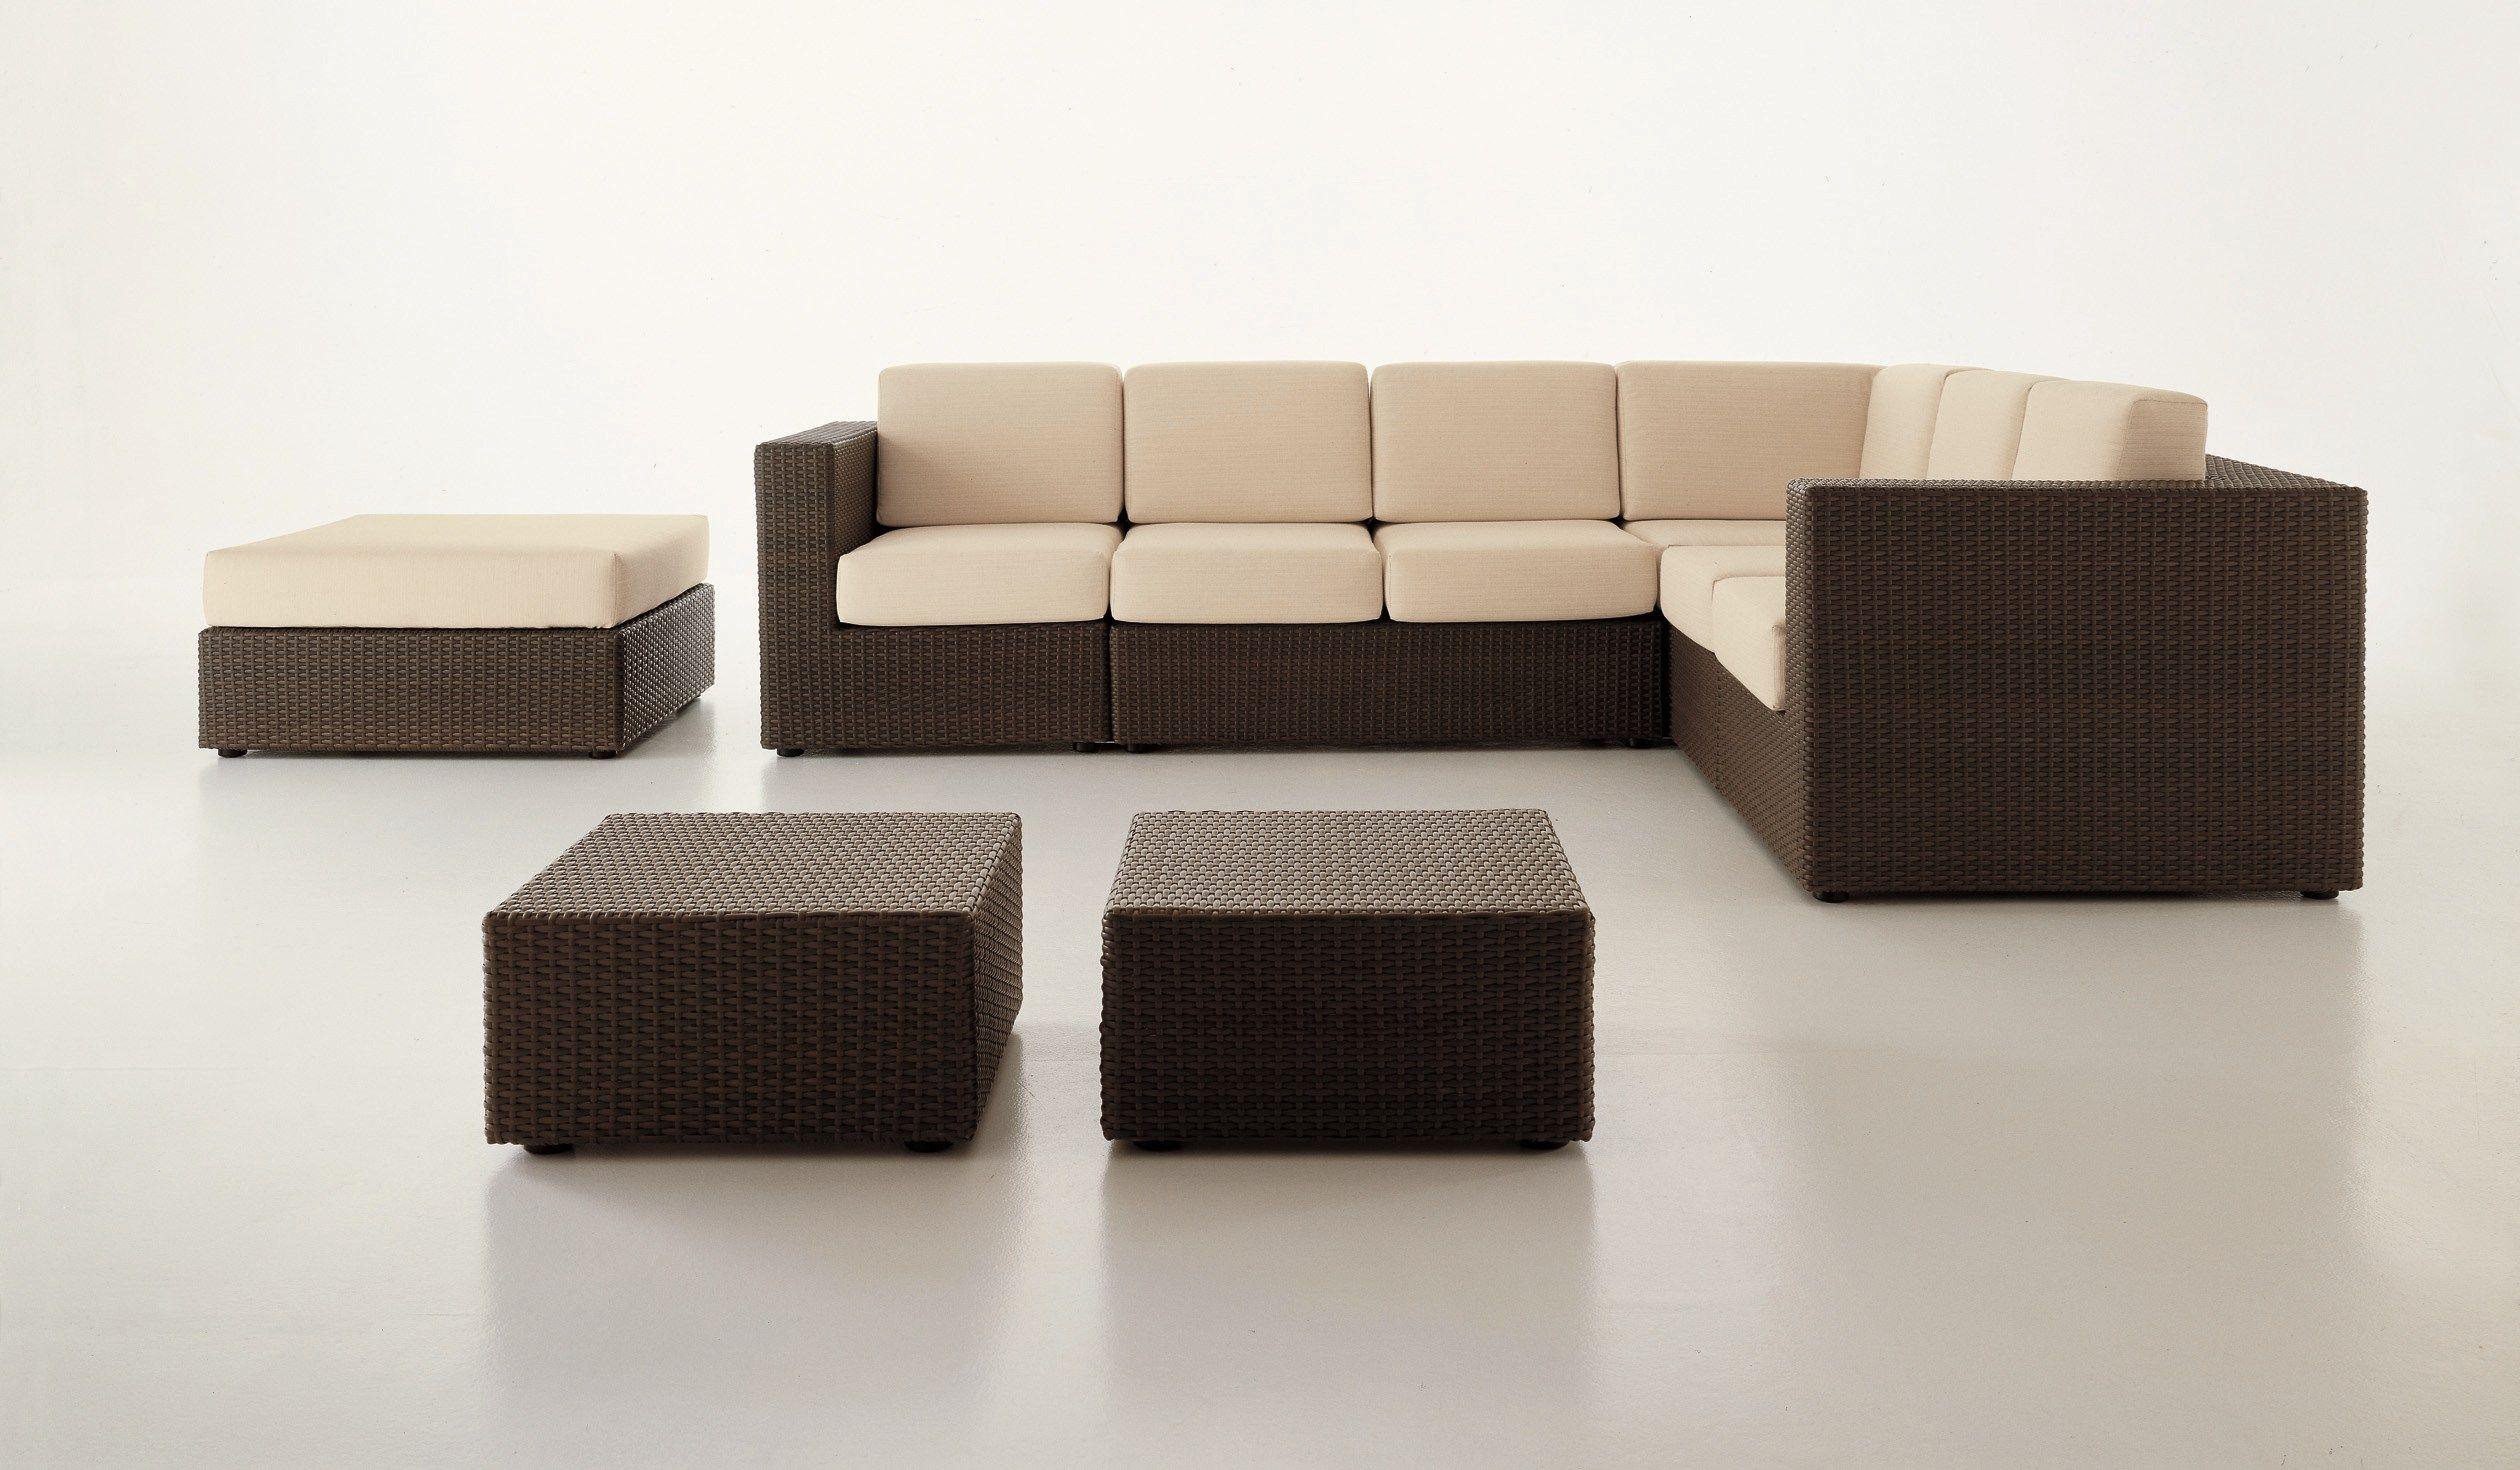 bahia pouf de jardin by dolcefarniente by dfn. Black Bedroom Furniture Sets. Home Design Ideas